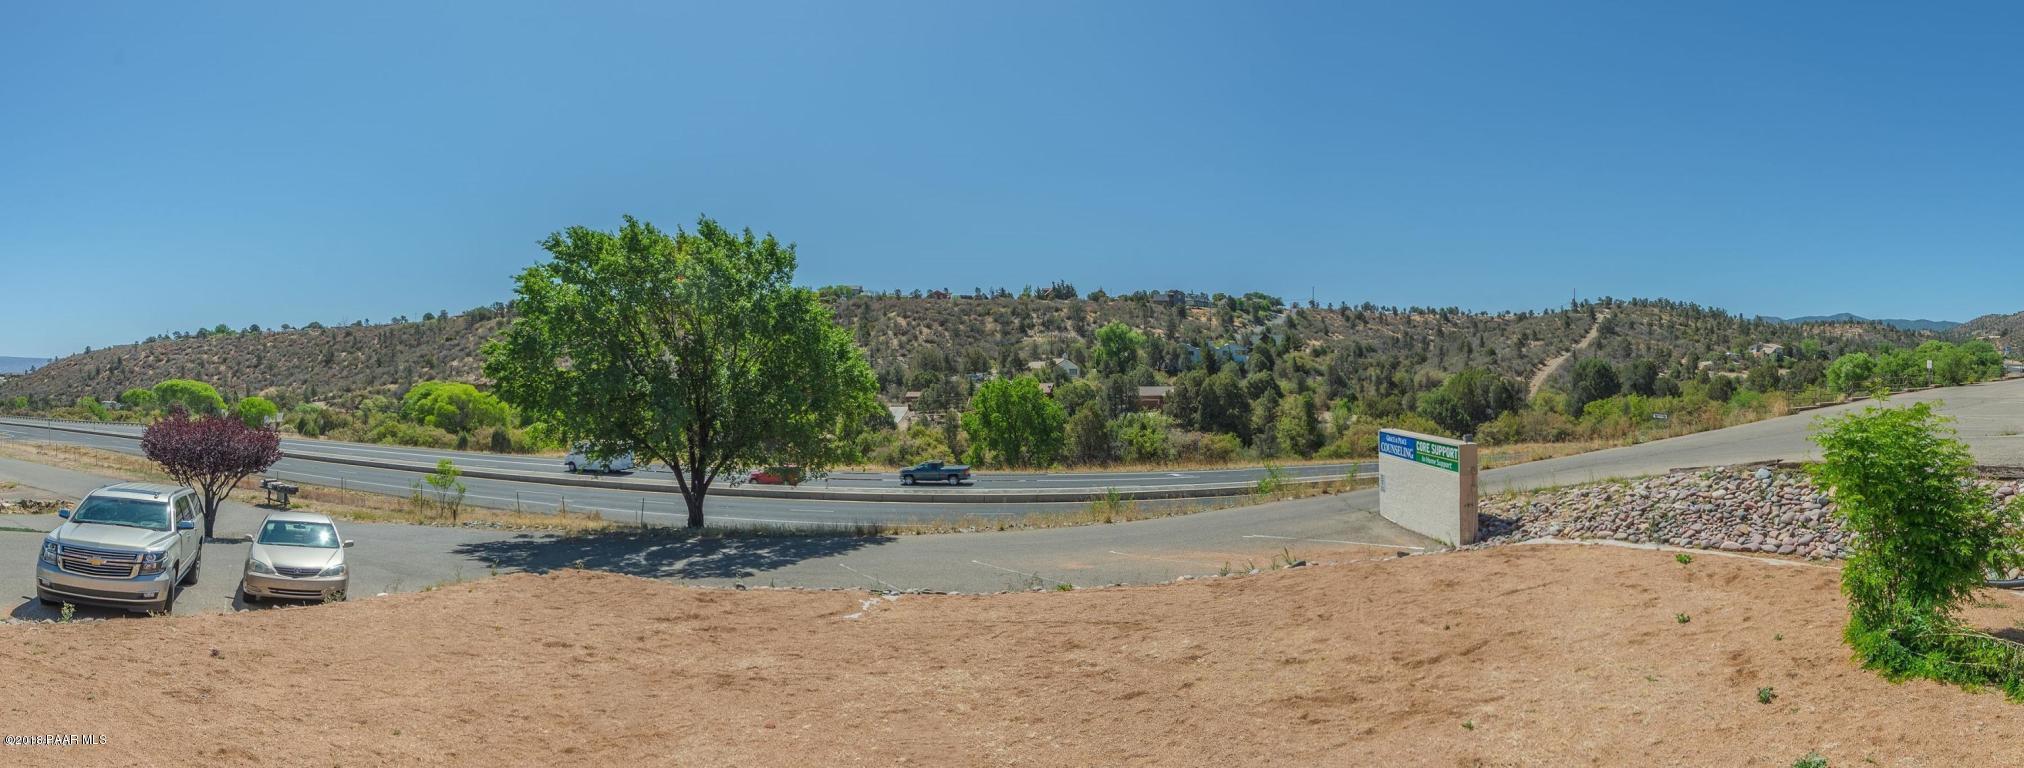 1285 Rhinestone Drive Prescott, AZ 86301 - MLS #: 1016085